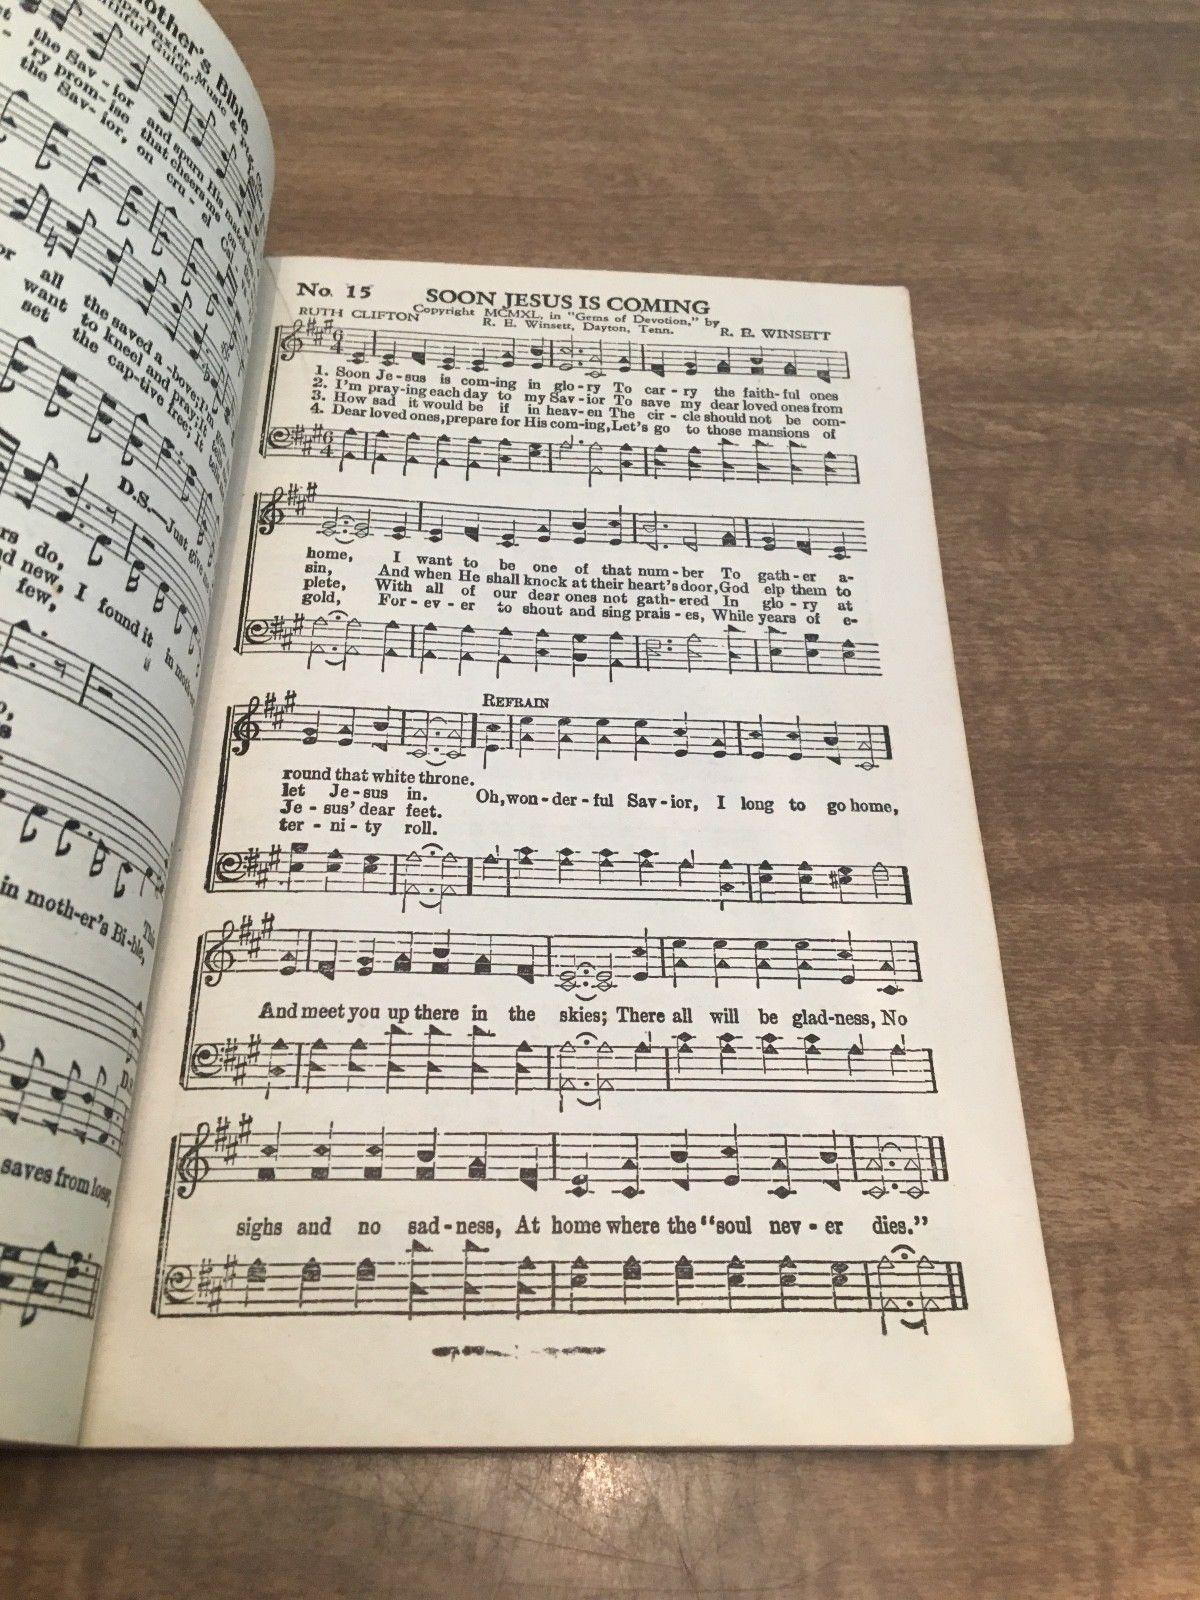 Joys Supernatural, edited by R.E. Winsett, 1942 Vintage Music Book